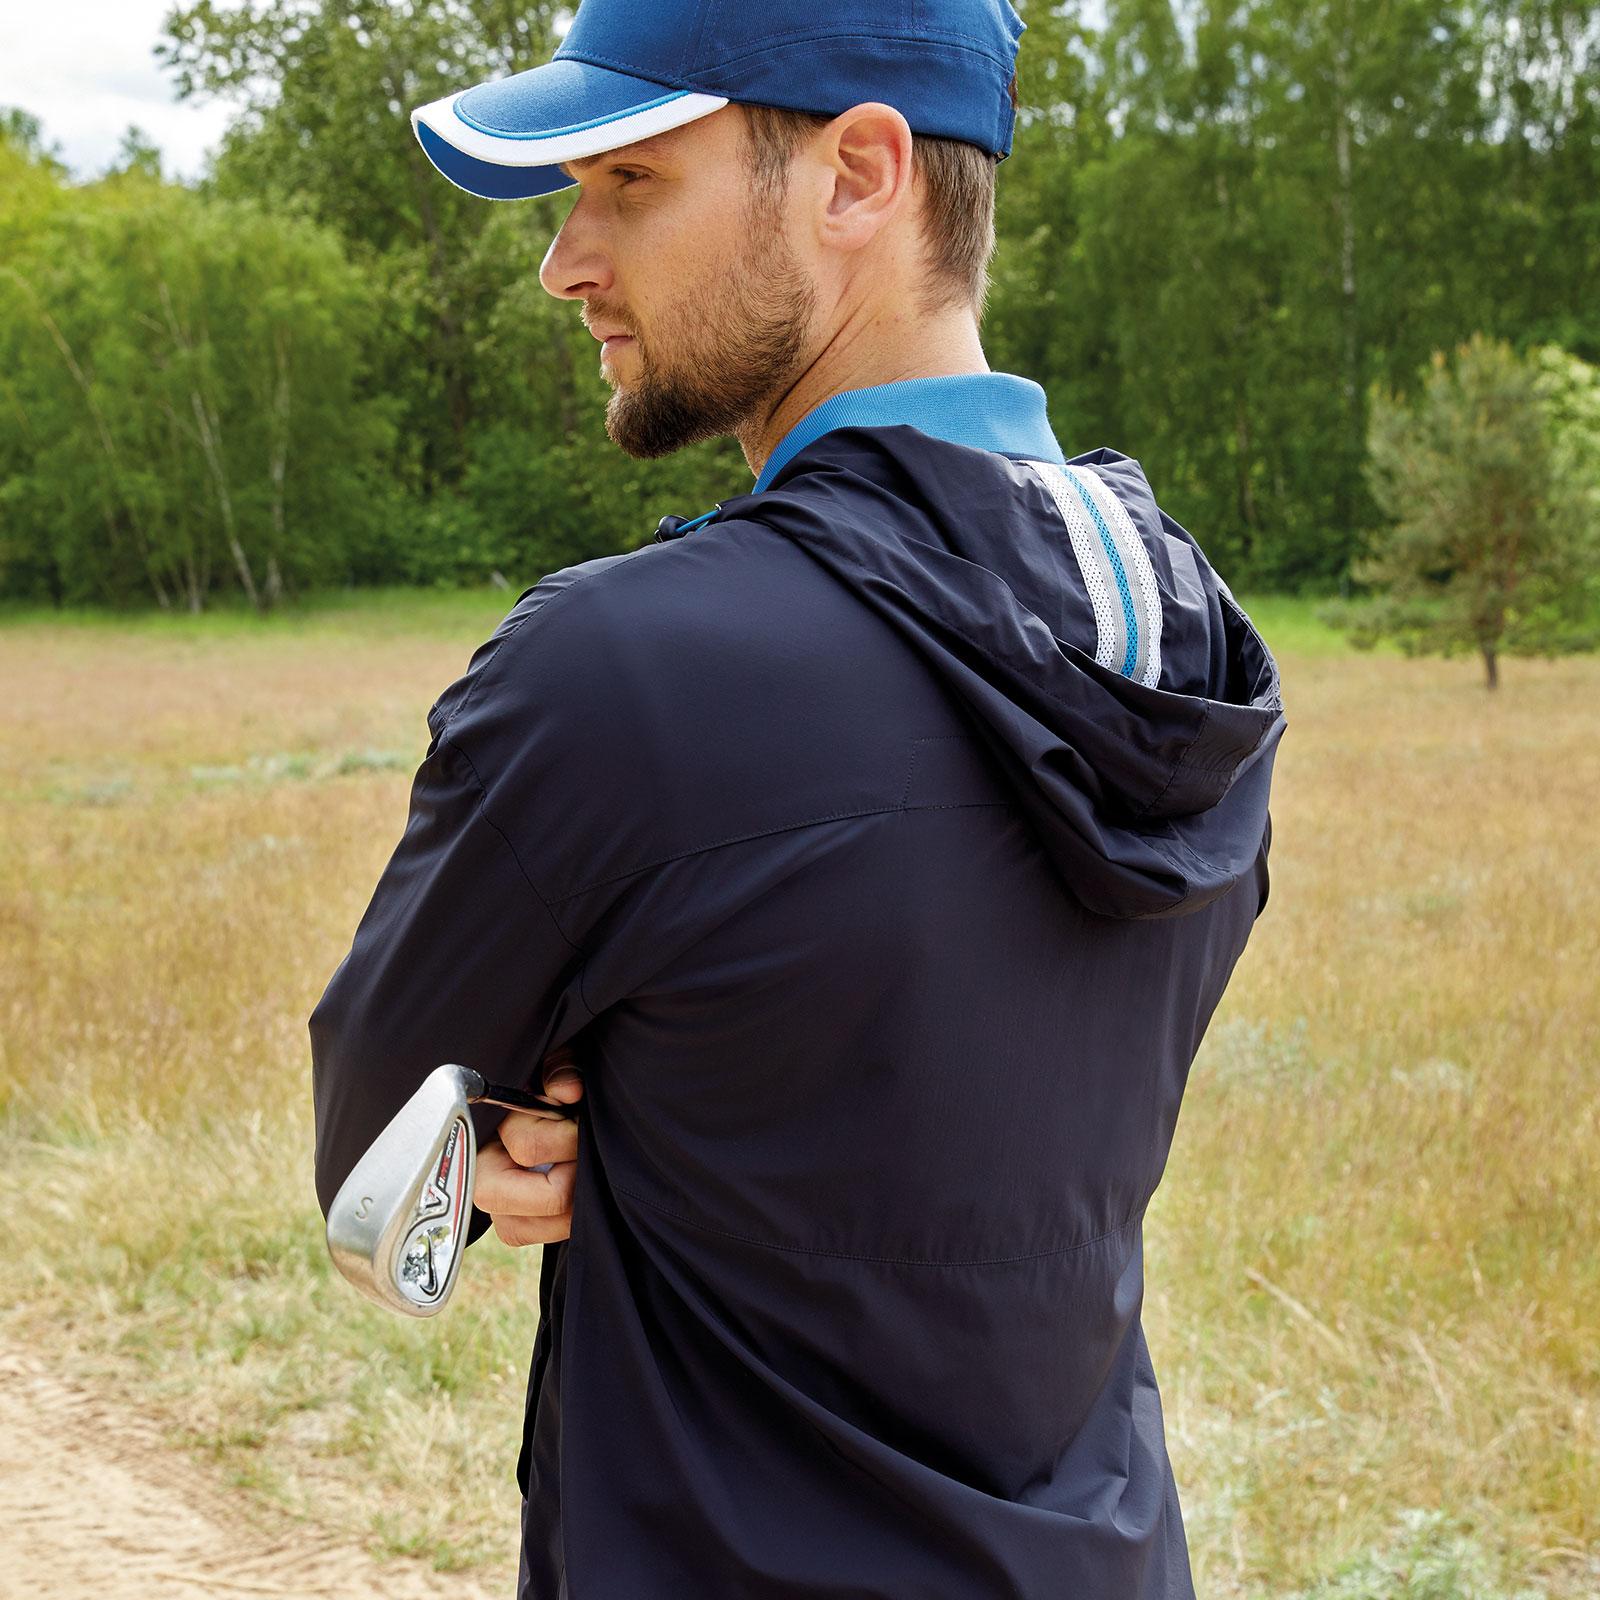 Herren Golfjacke mit Windschutz, Kapuze und kurzem Zip in Loose Fit